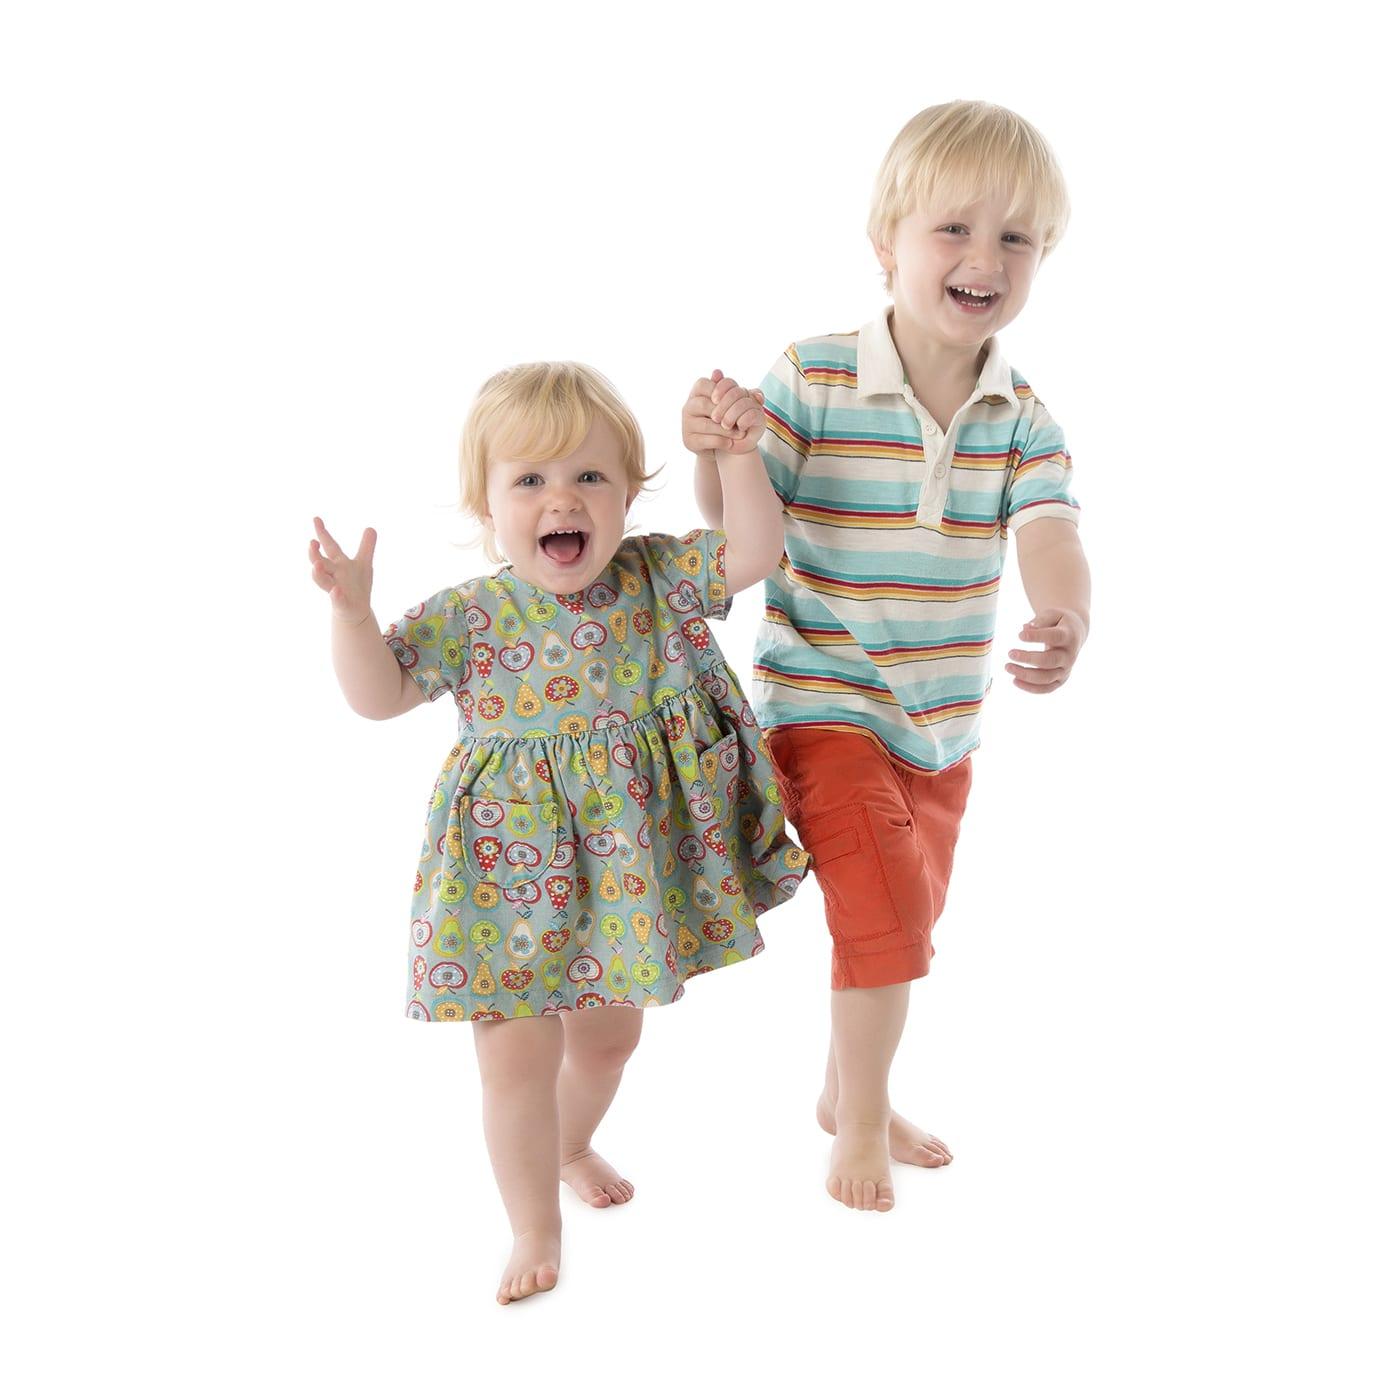 children-photos-twofrontteeth17